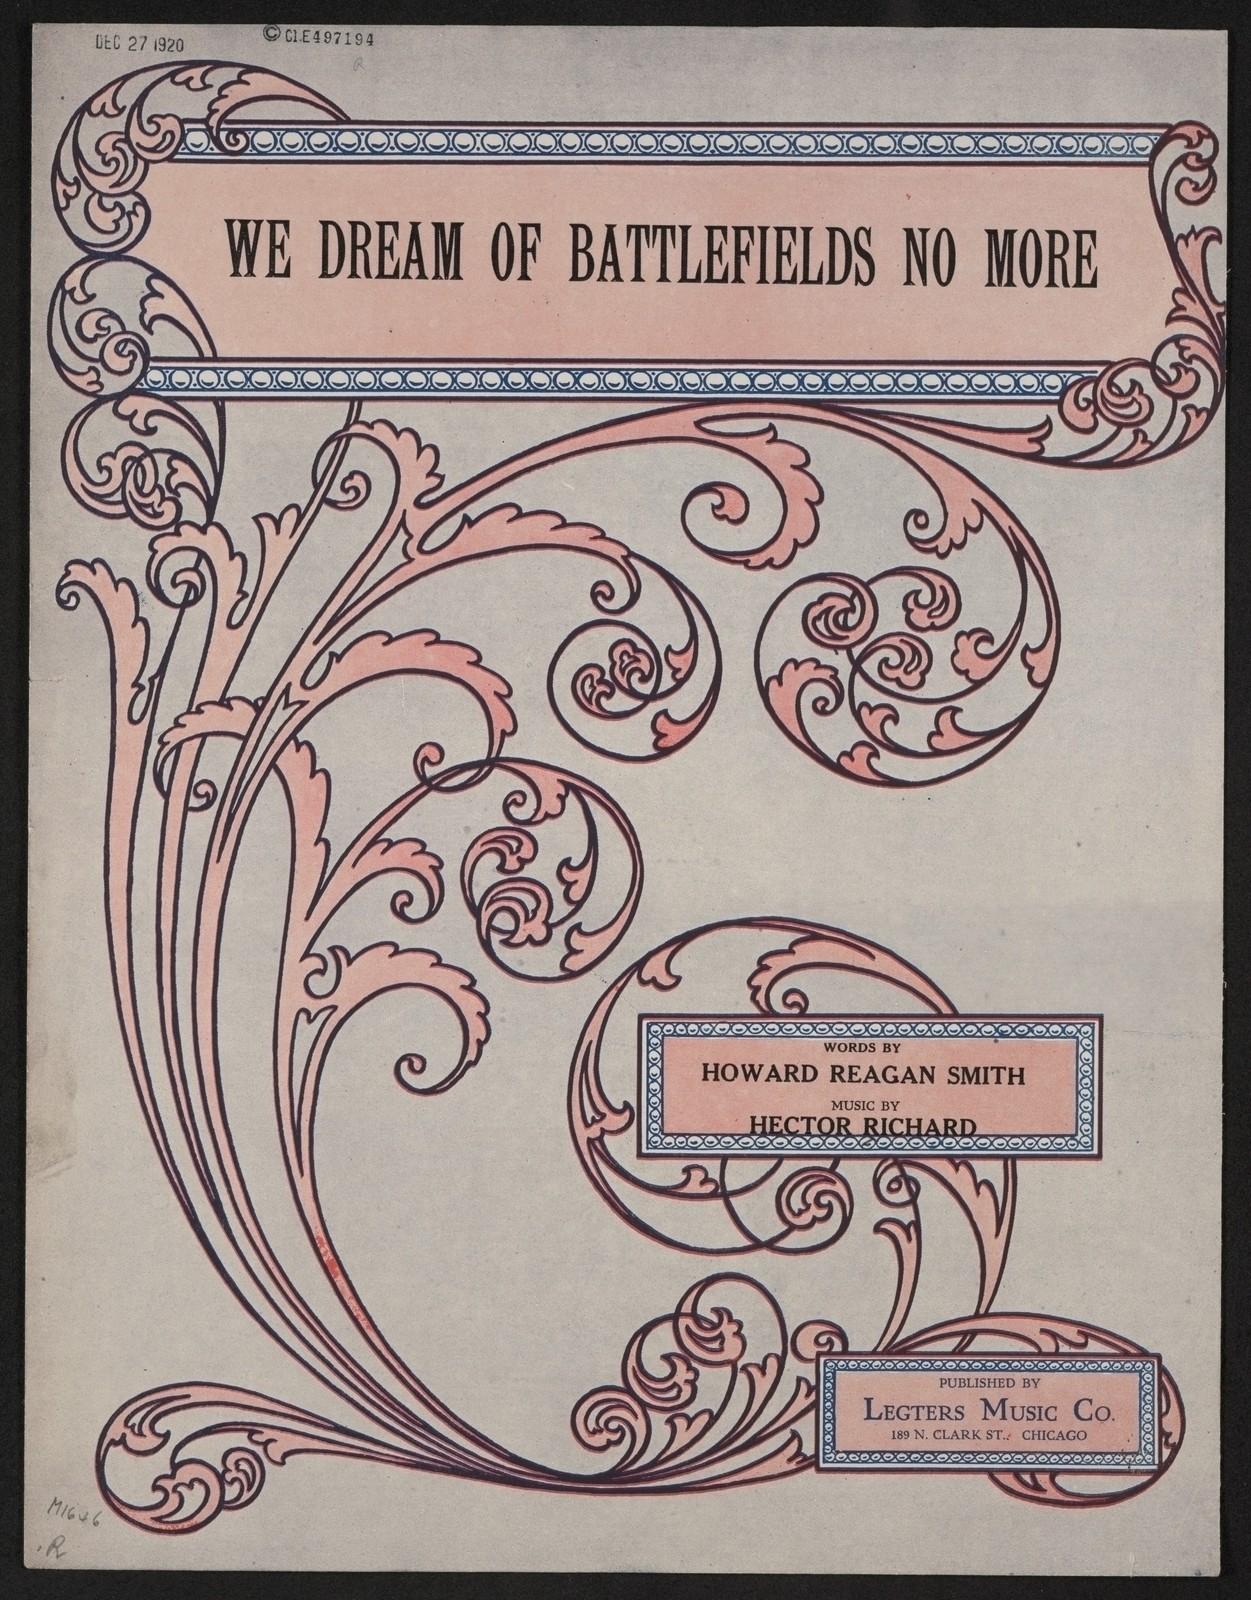 We dream of battlefields no more